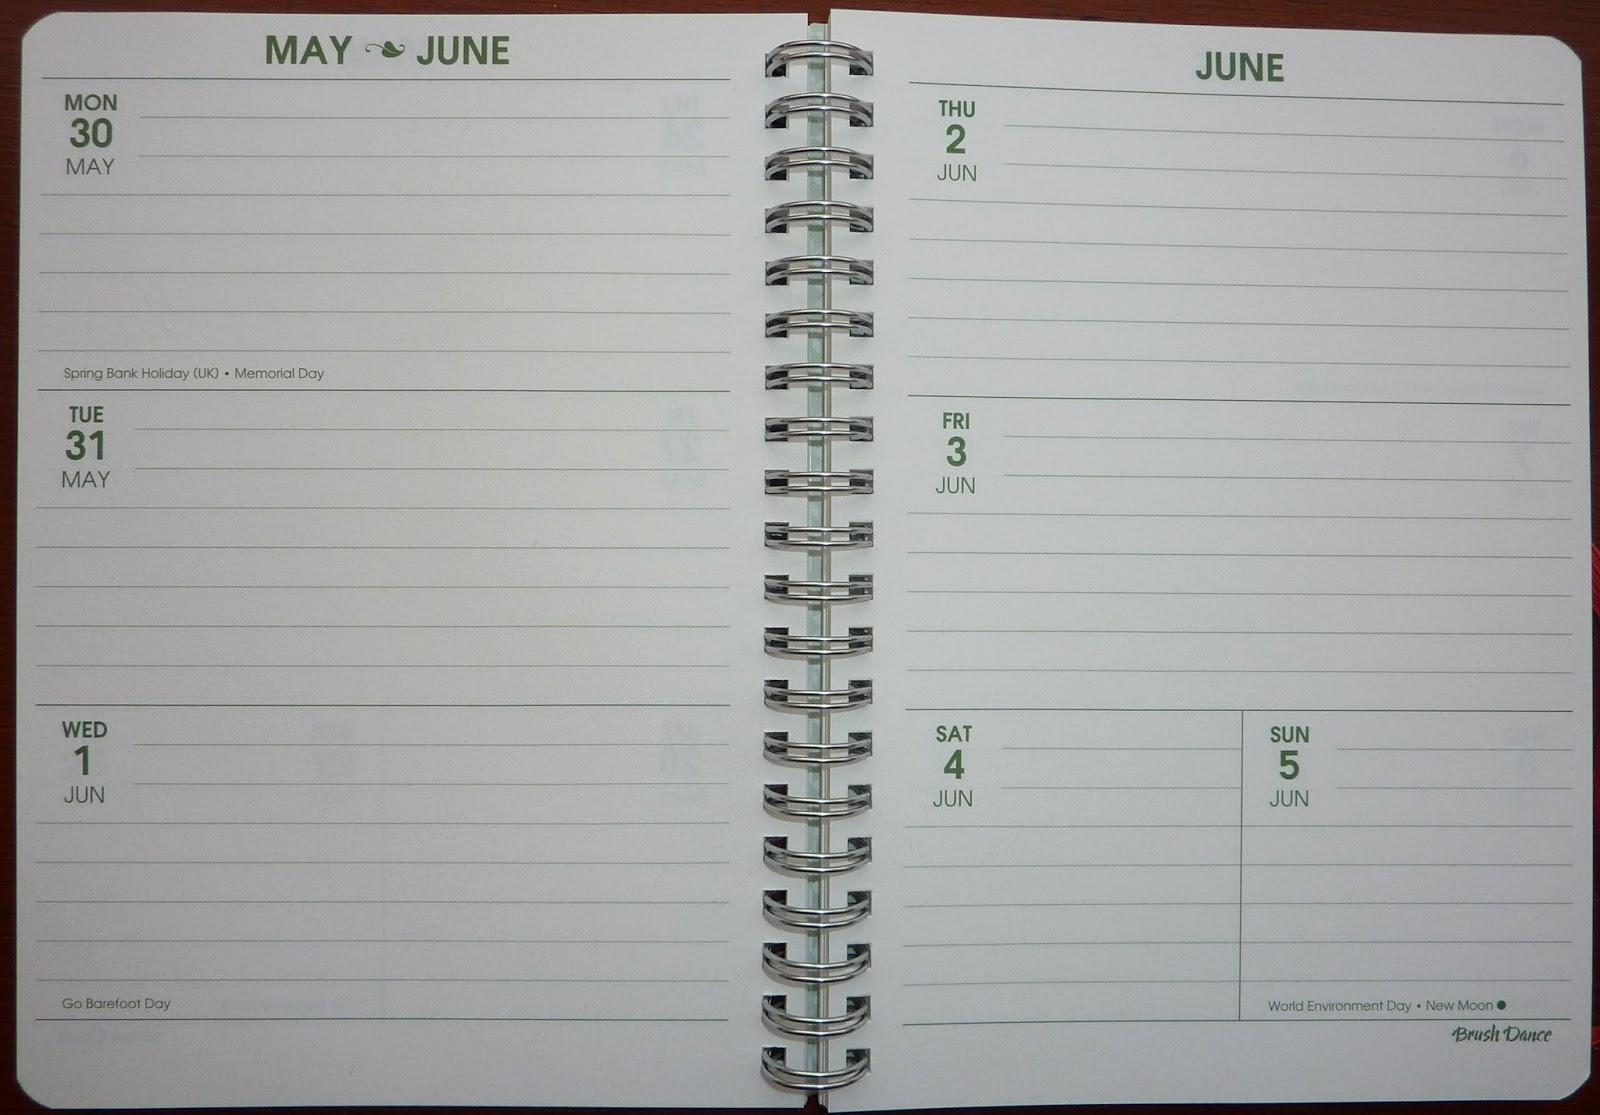 Date book planner in Australia